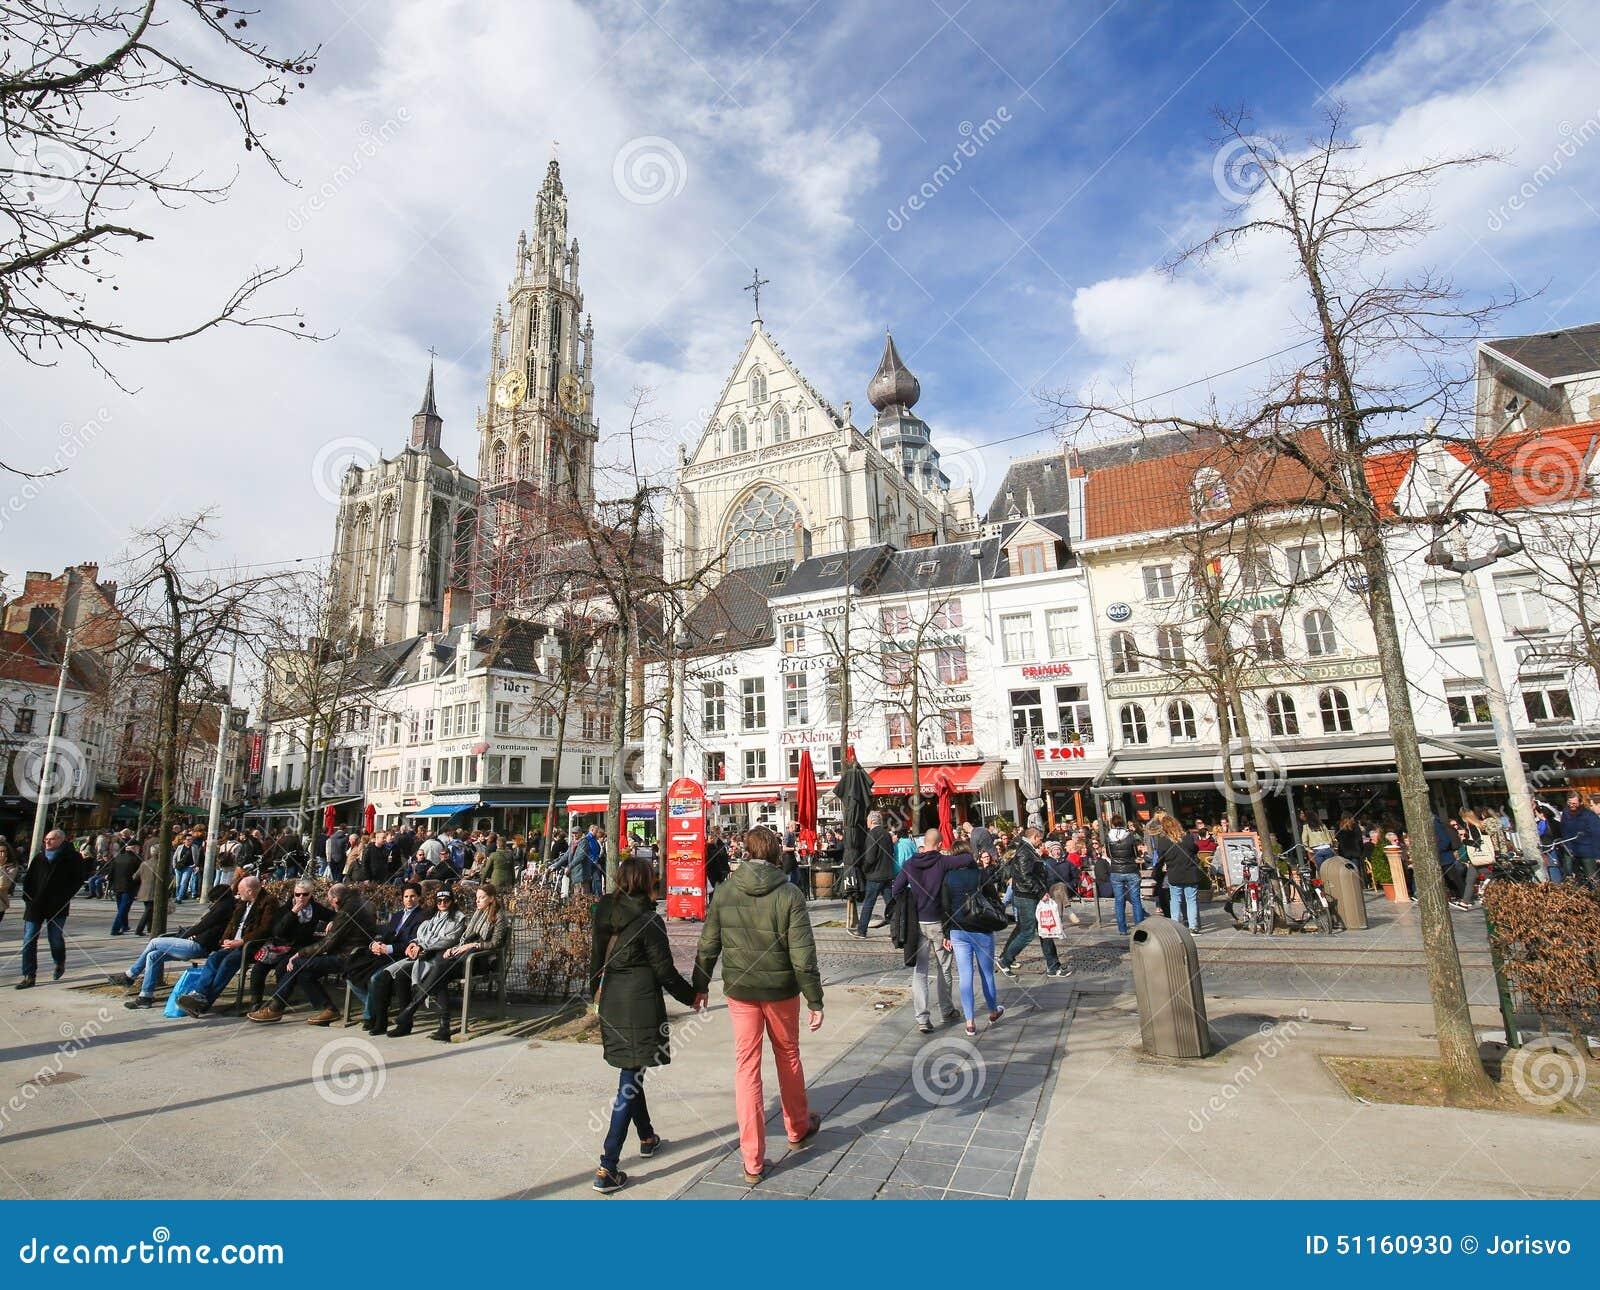 Groenplaats και καθεδρικός ναός της κυρίας μας στην Αμβέρσα, Βέλγιο